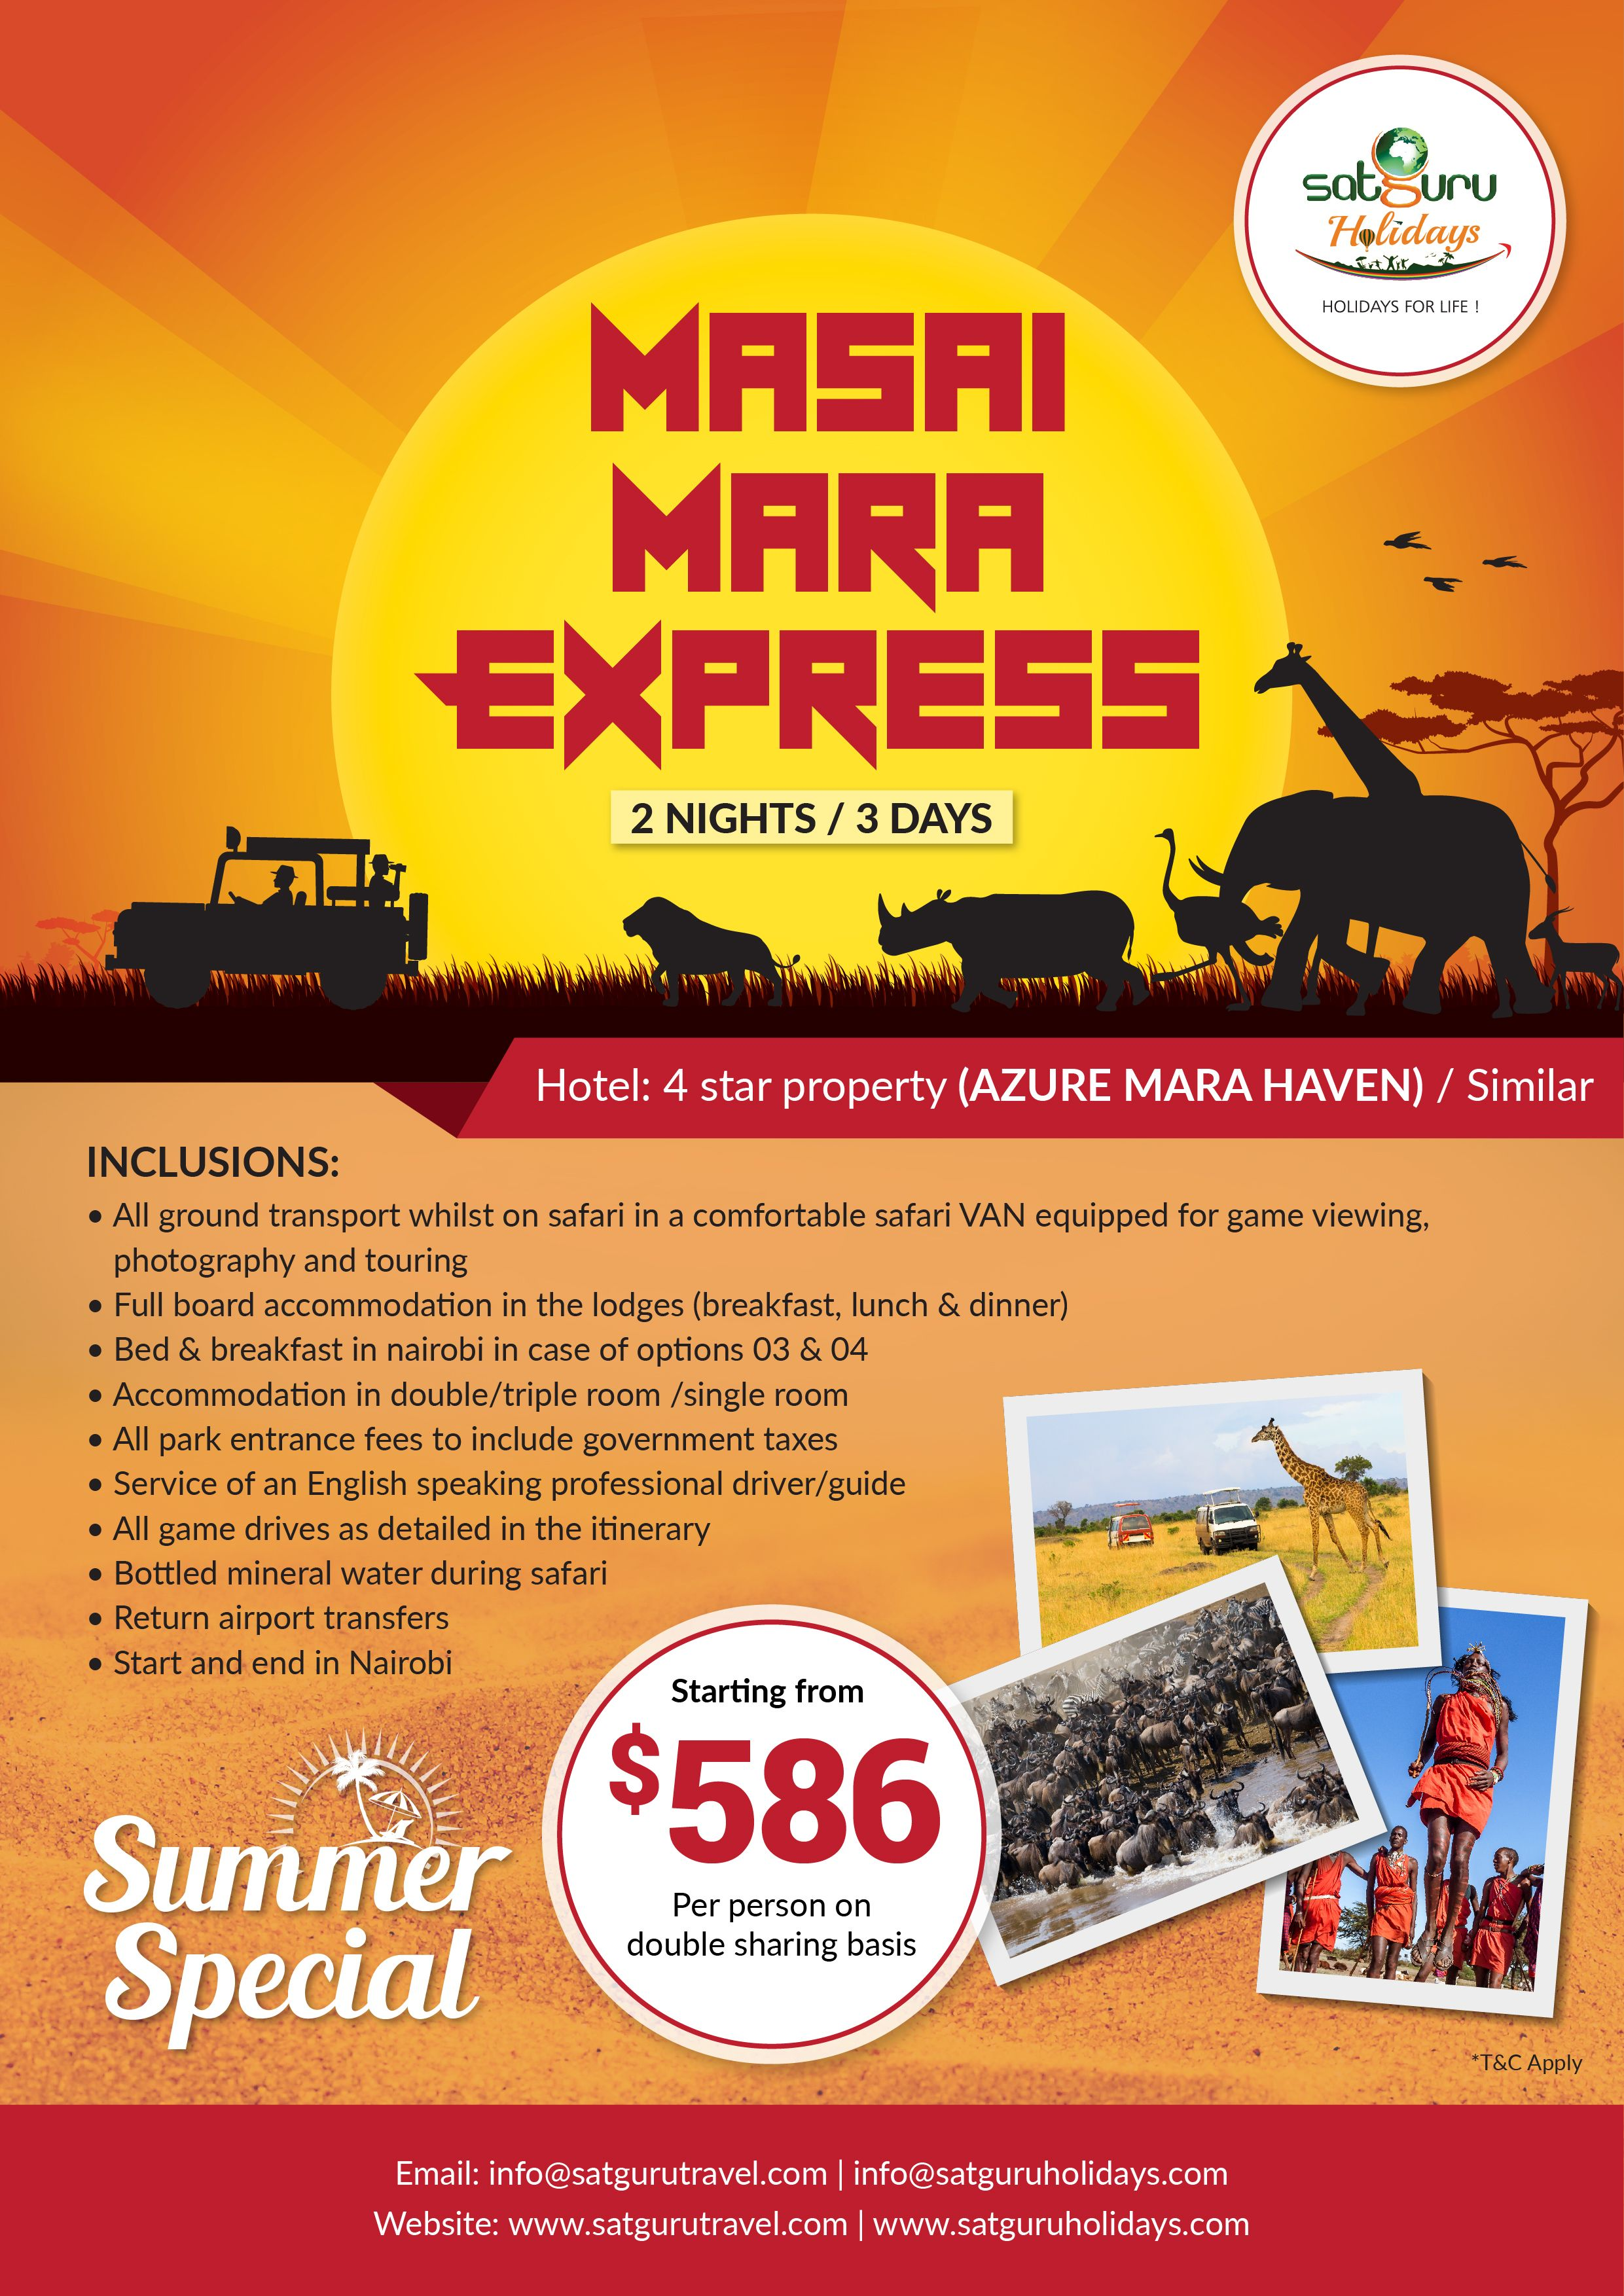 africa  Travel management Best holiday deals Days hotel